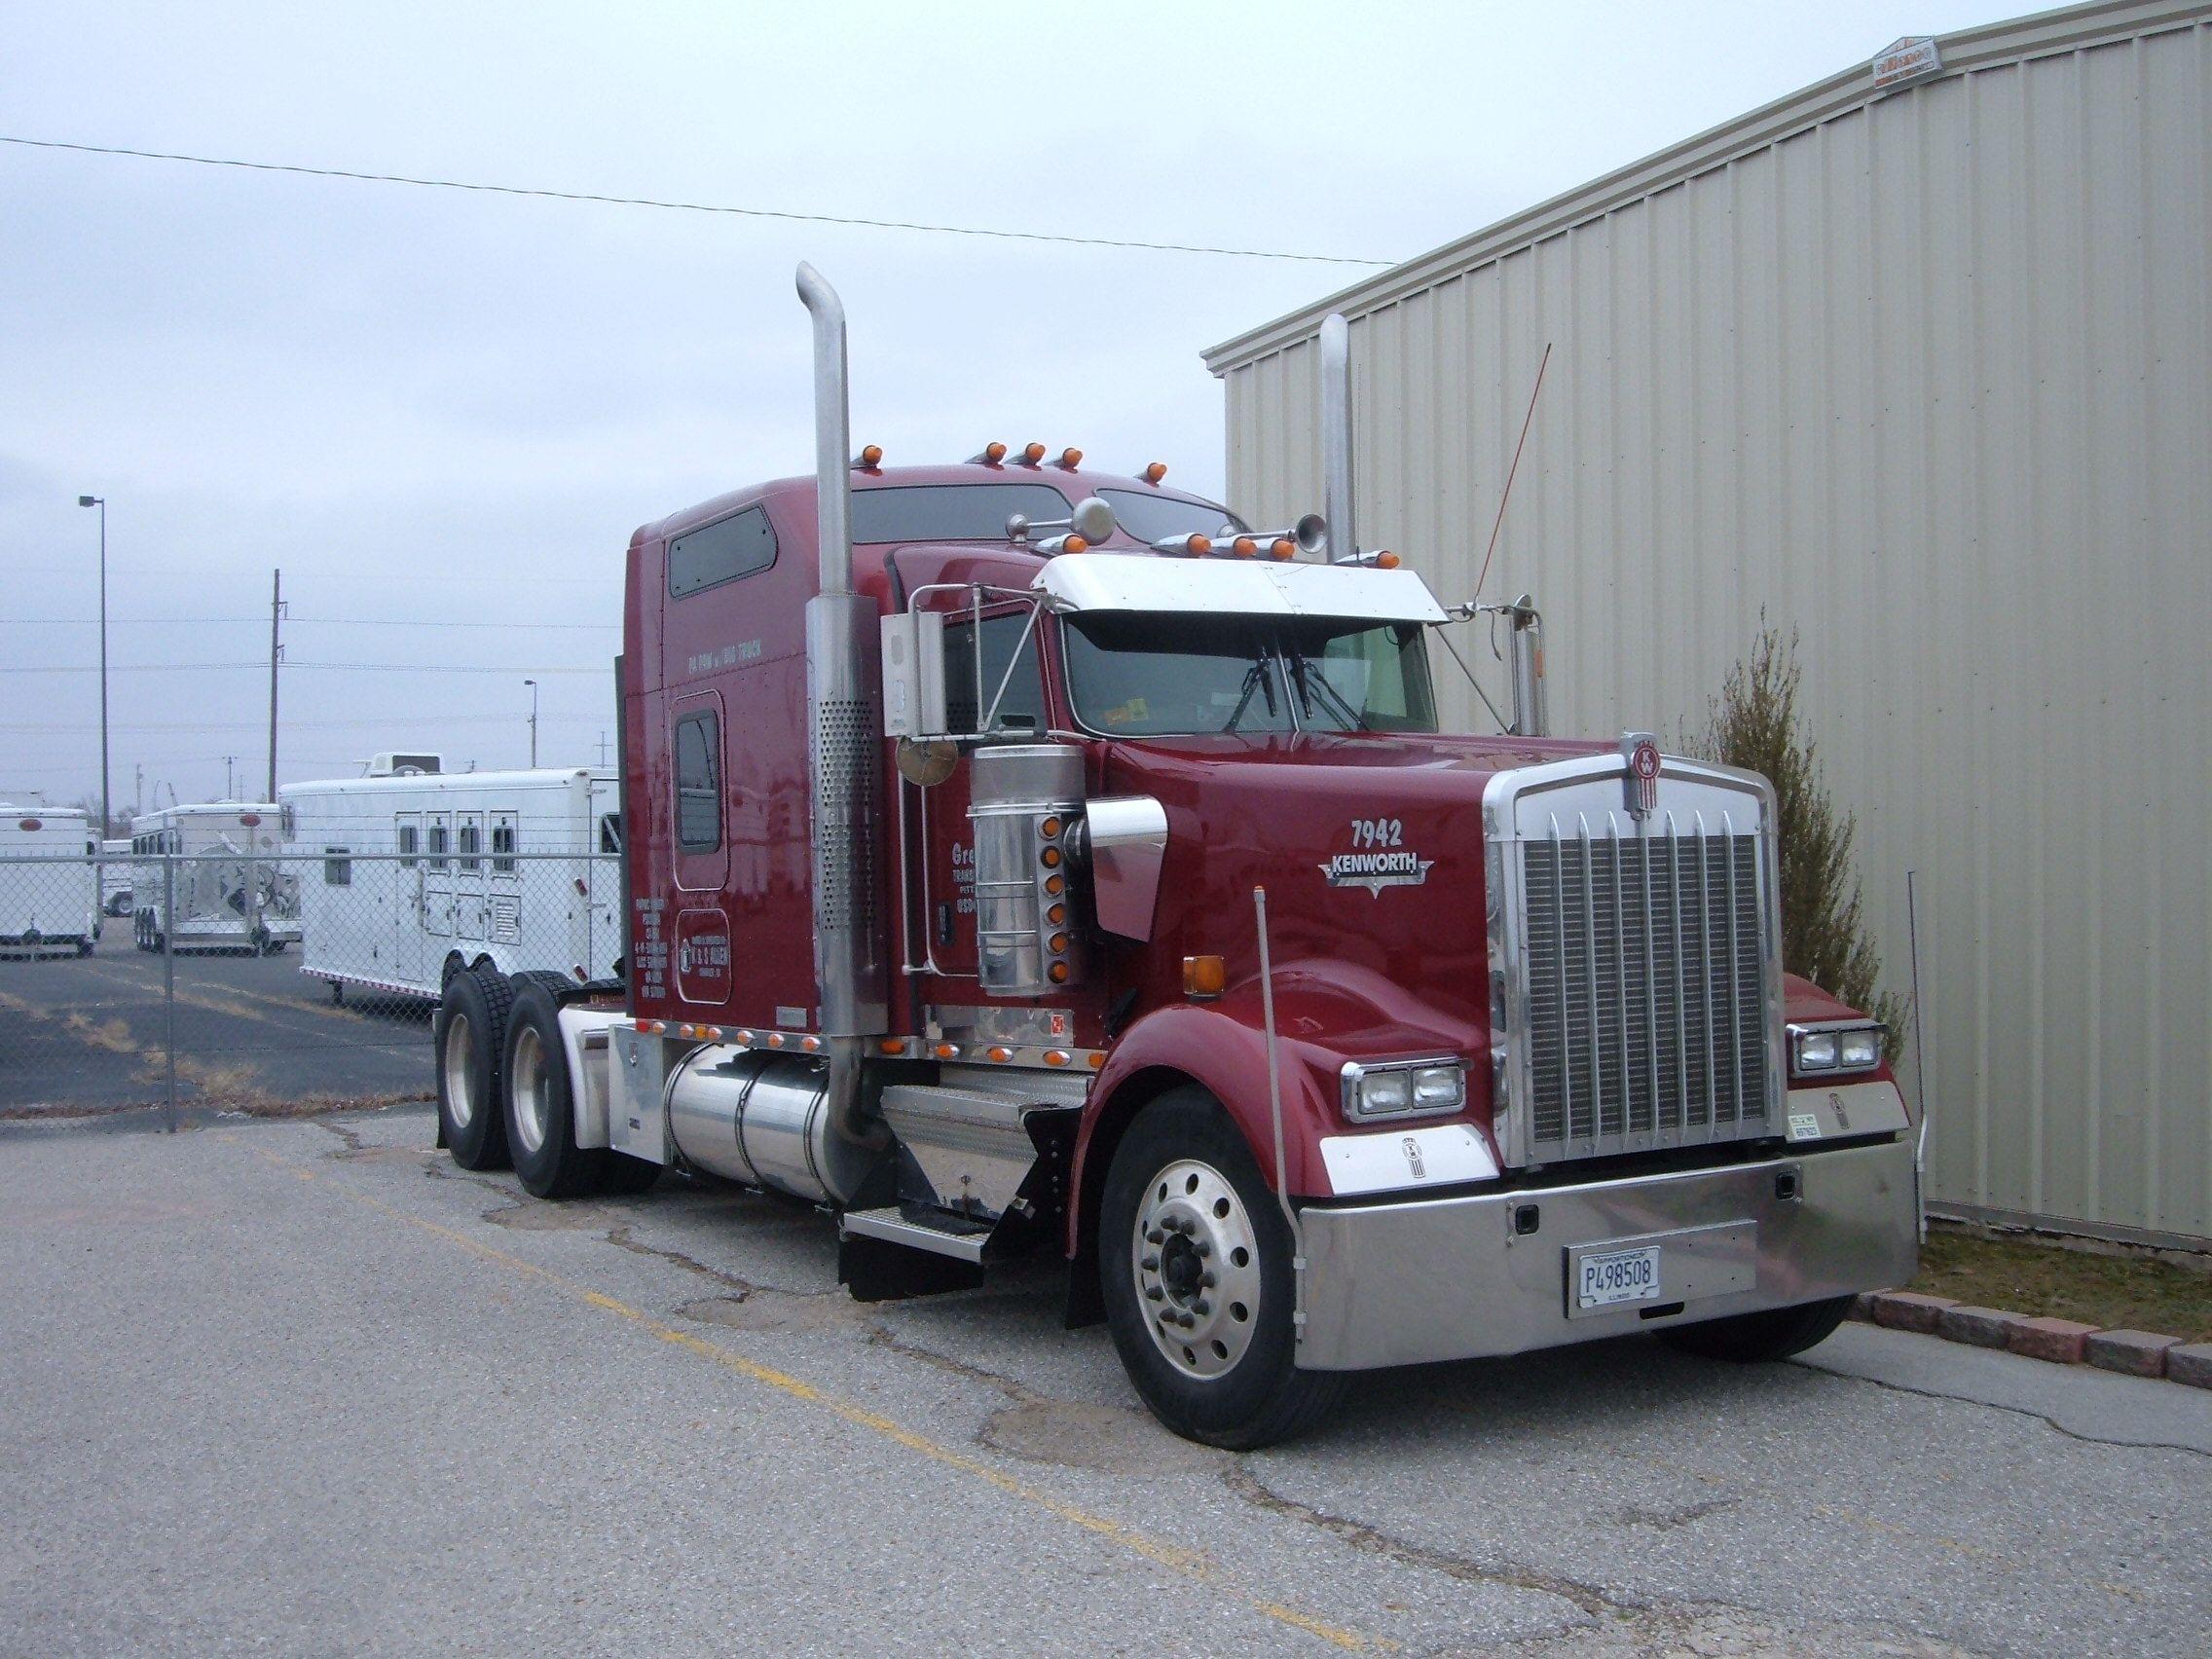 5996 for sale silverado chevrolet utility ford flatbed truck kenworth tractor truck w sleeper